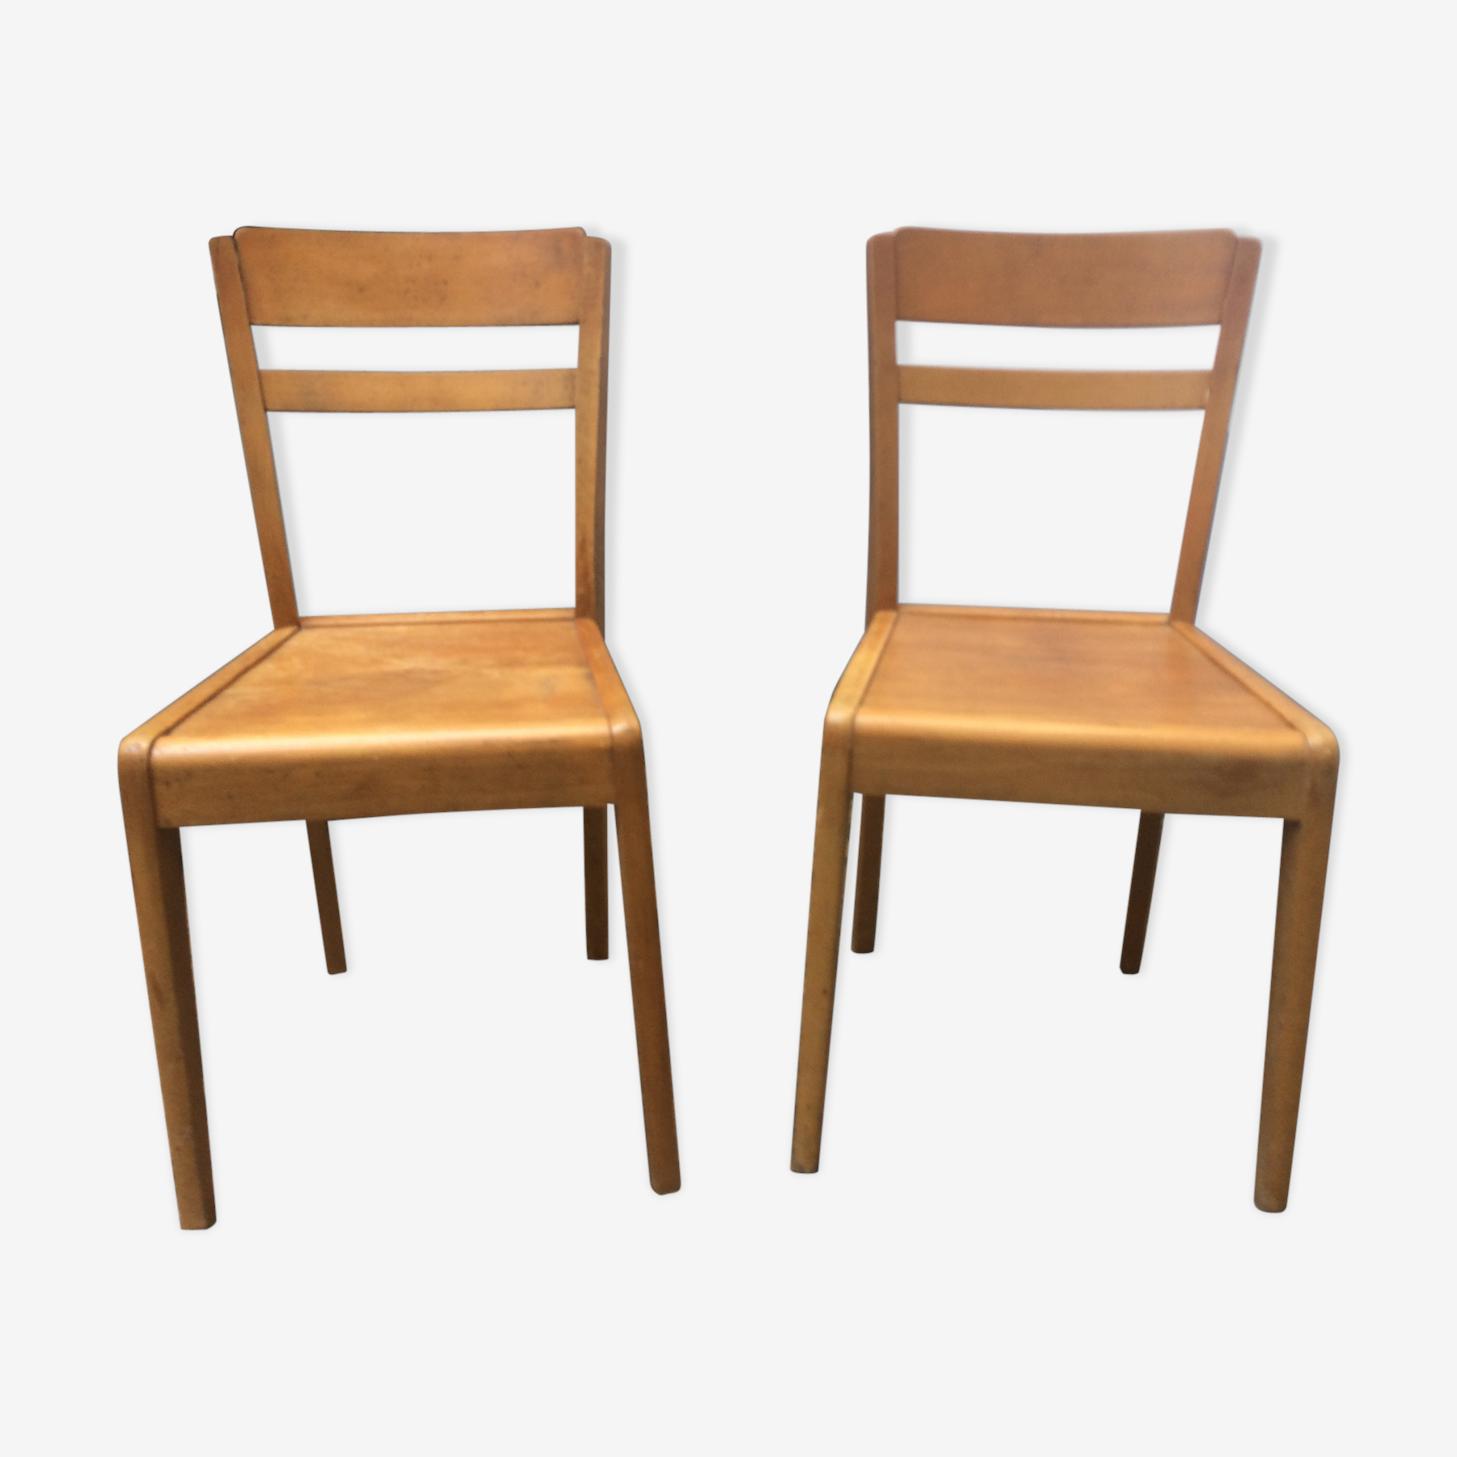 Pair of chairs stella